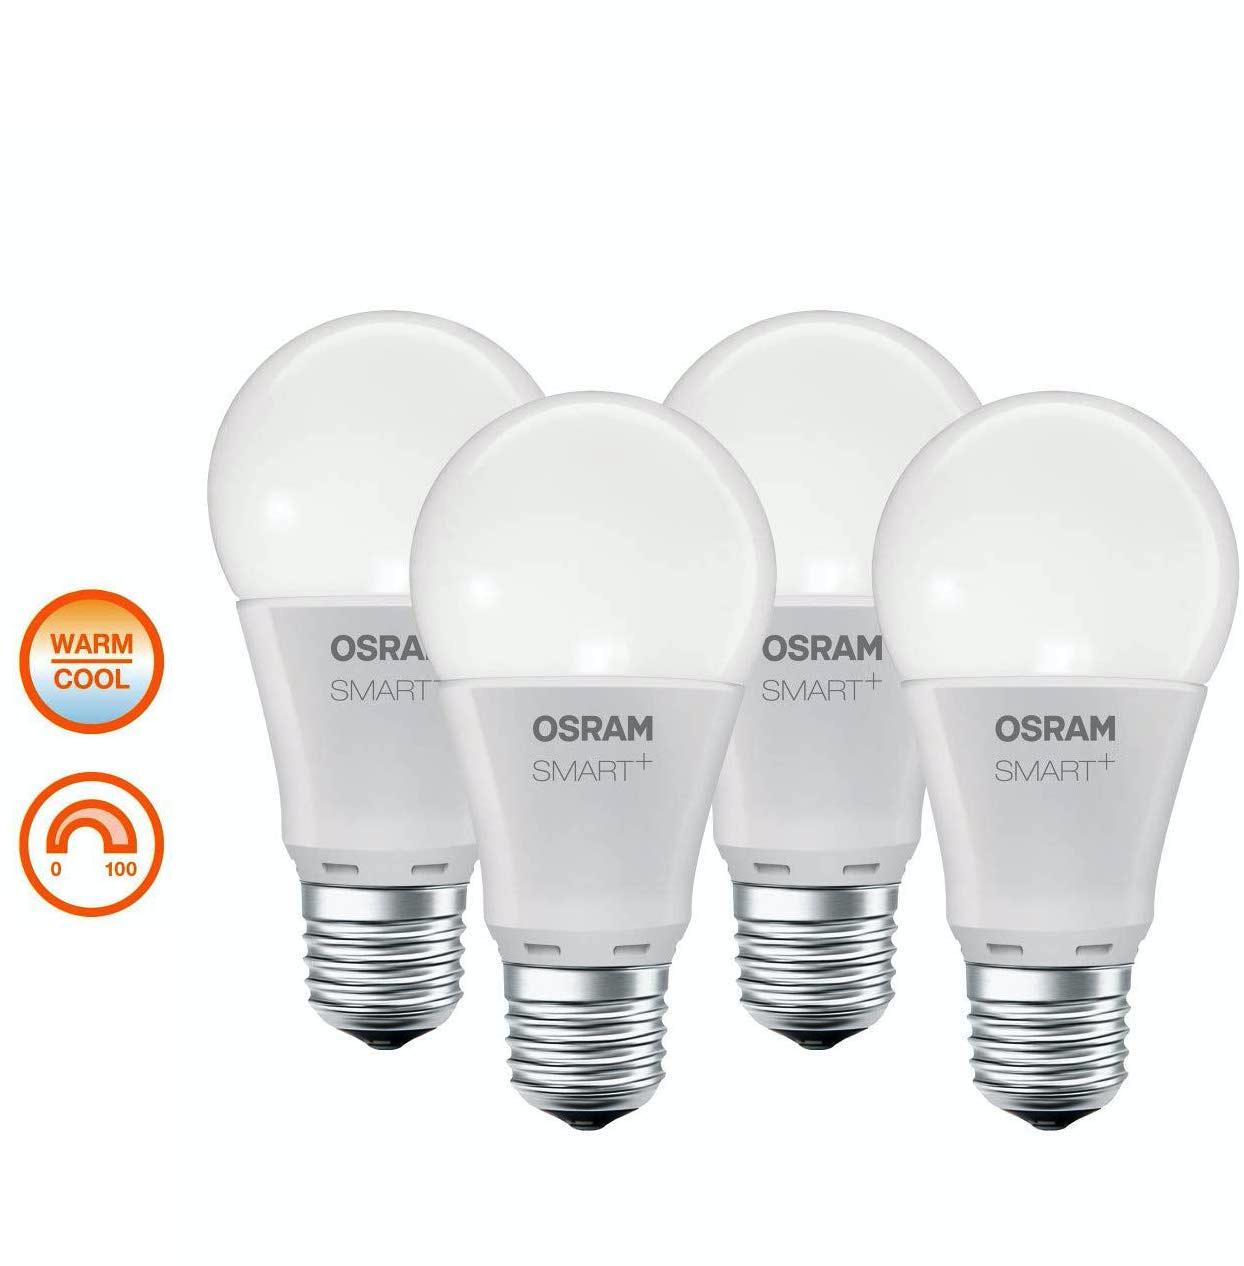 OSRAM Smart+ LED E27, ZigBee, warmweiß bis tageslicht, dimmbar, kompatibel mit Echo Plus / Show (2. Gen.), Philips Hue Bridge, 4er Pack